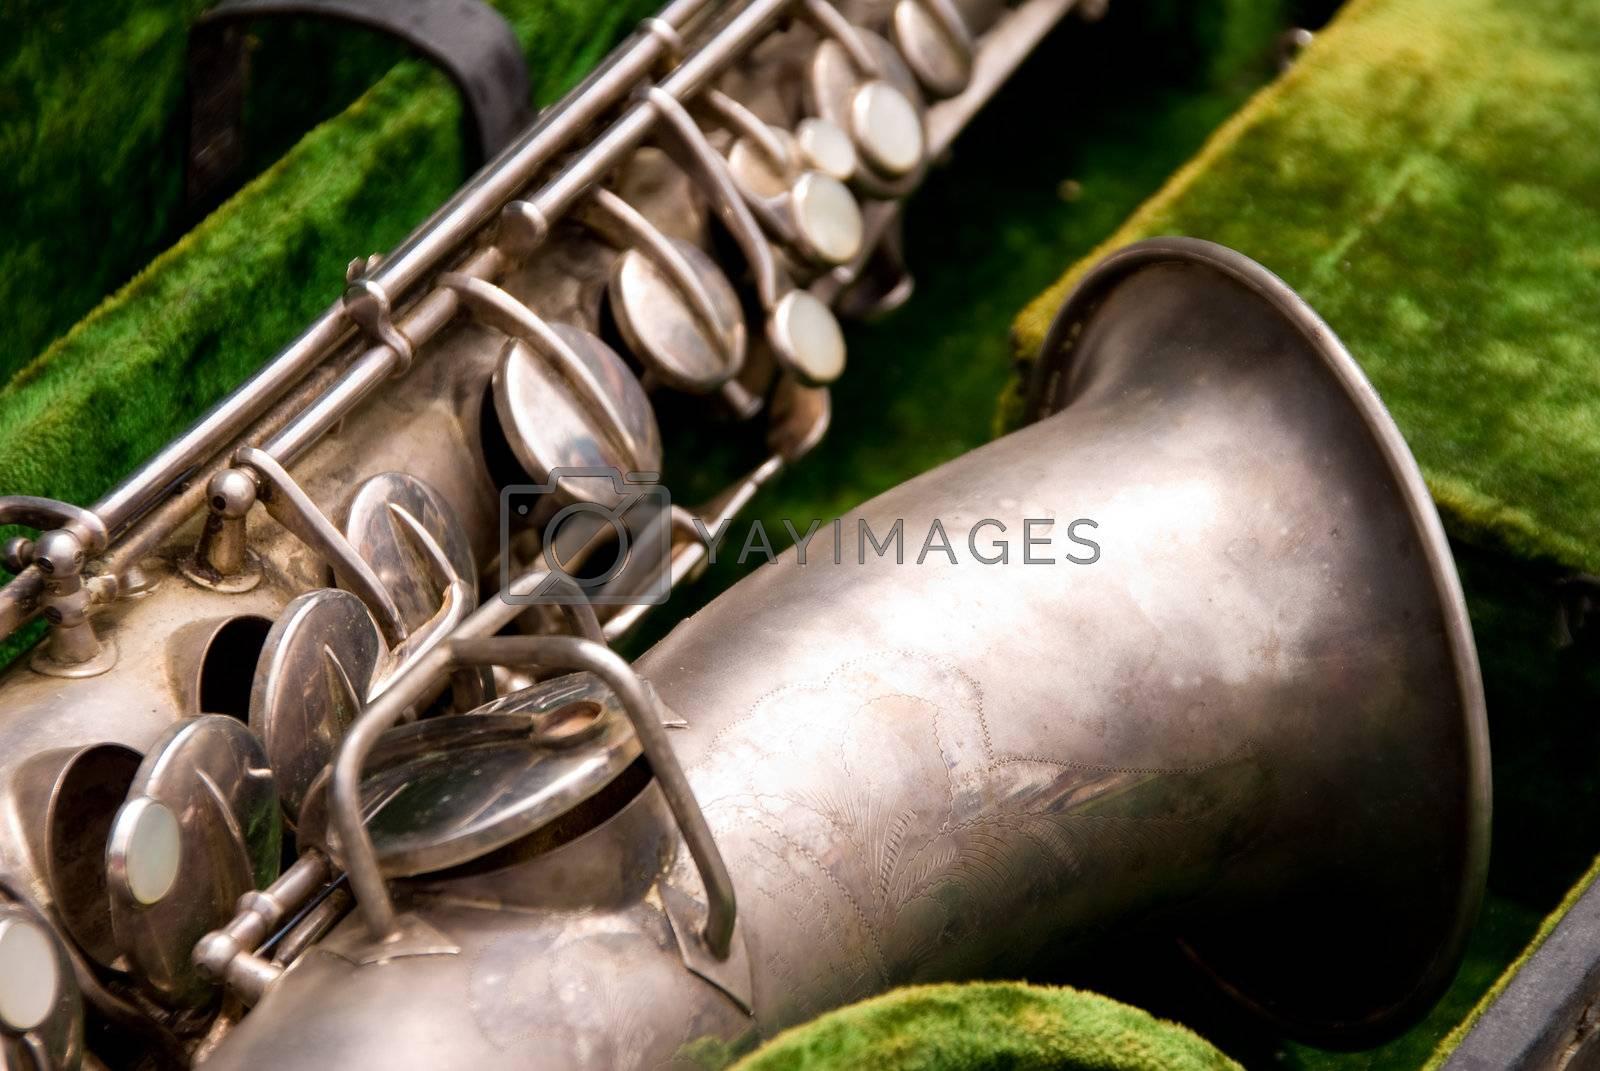 An antique horn known as a saxophone.